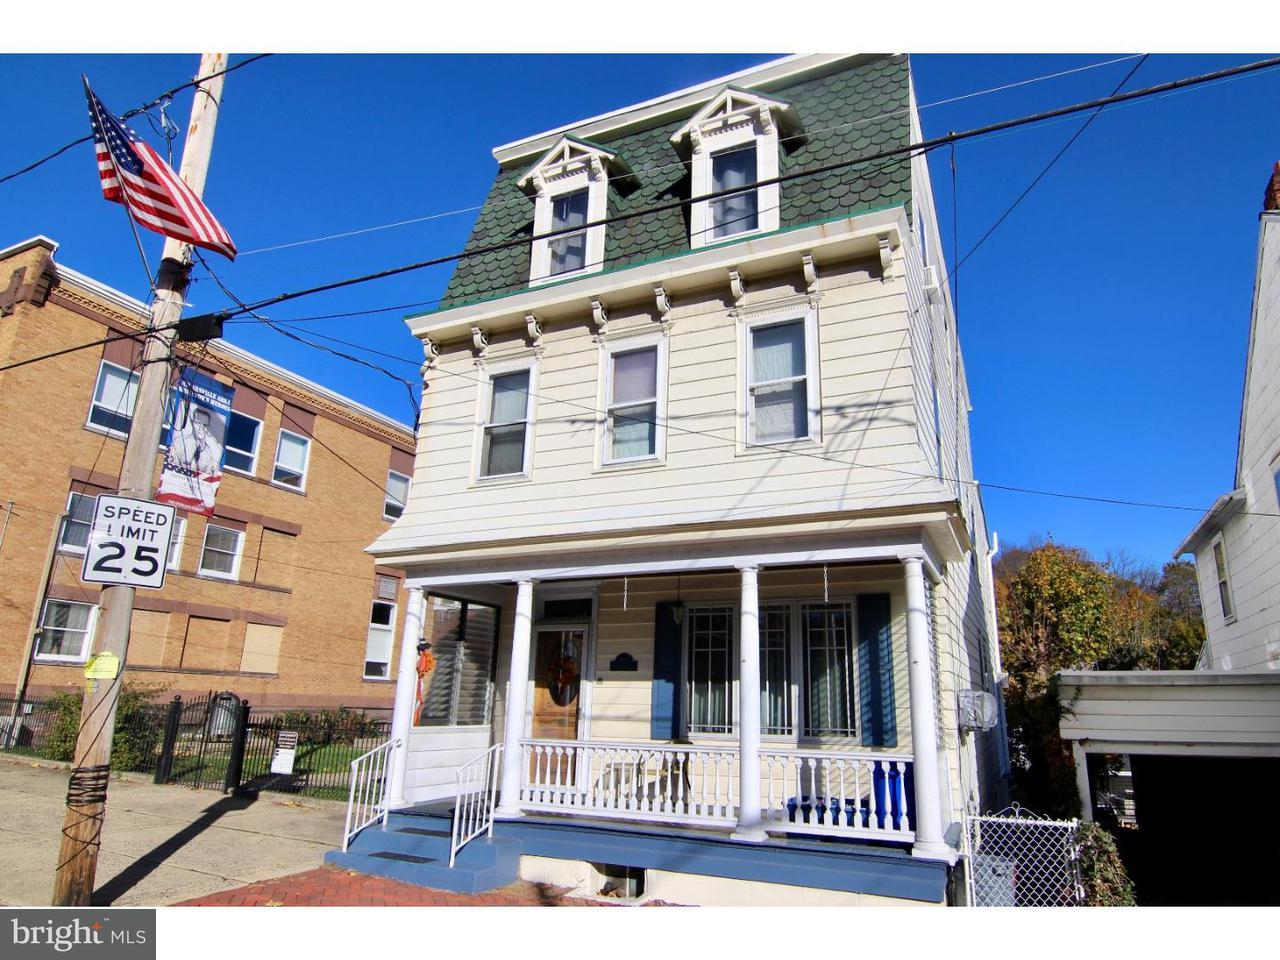 Single Family Home for Sale at 532 SUNBURY Street Minersville, Pennsylvania 17954 United States